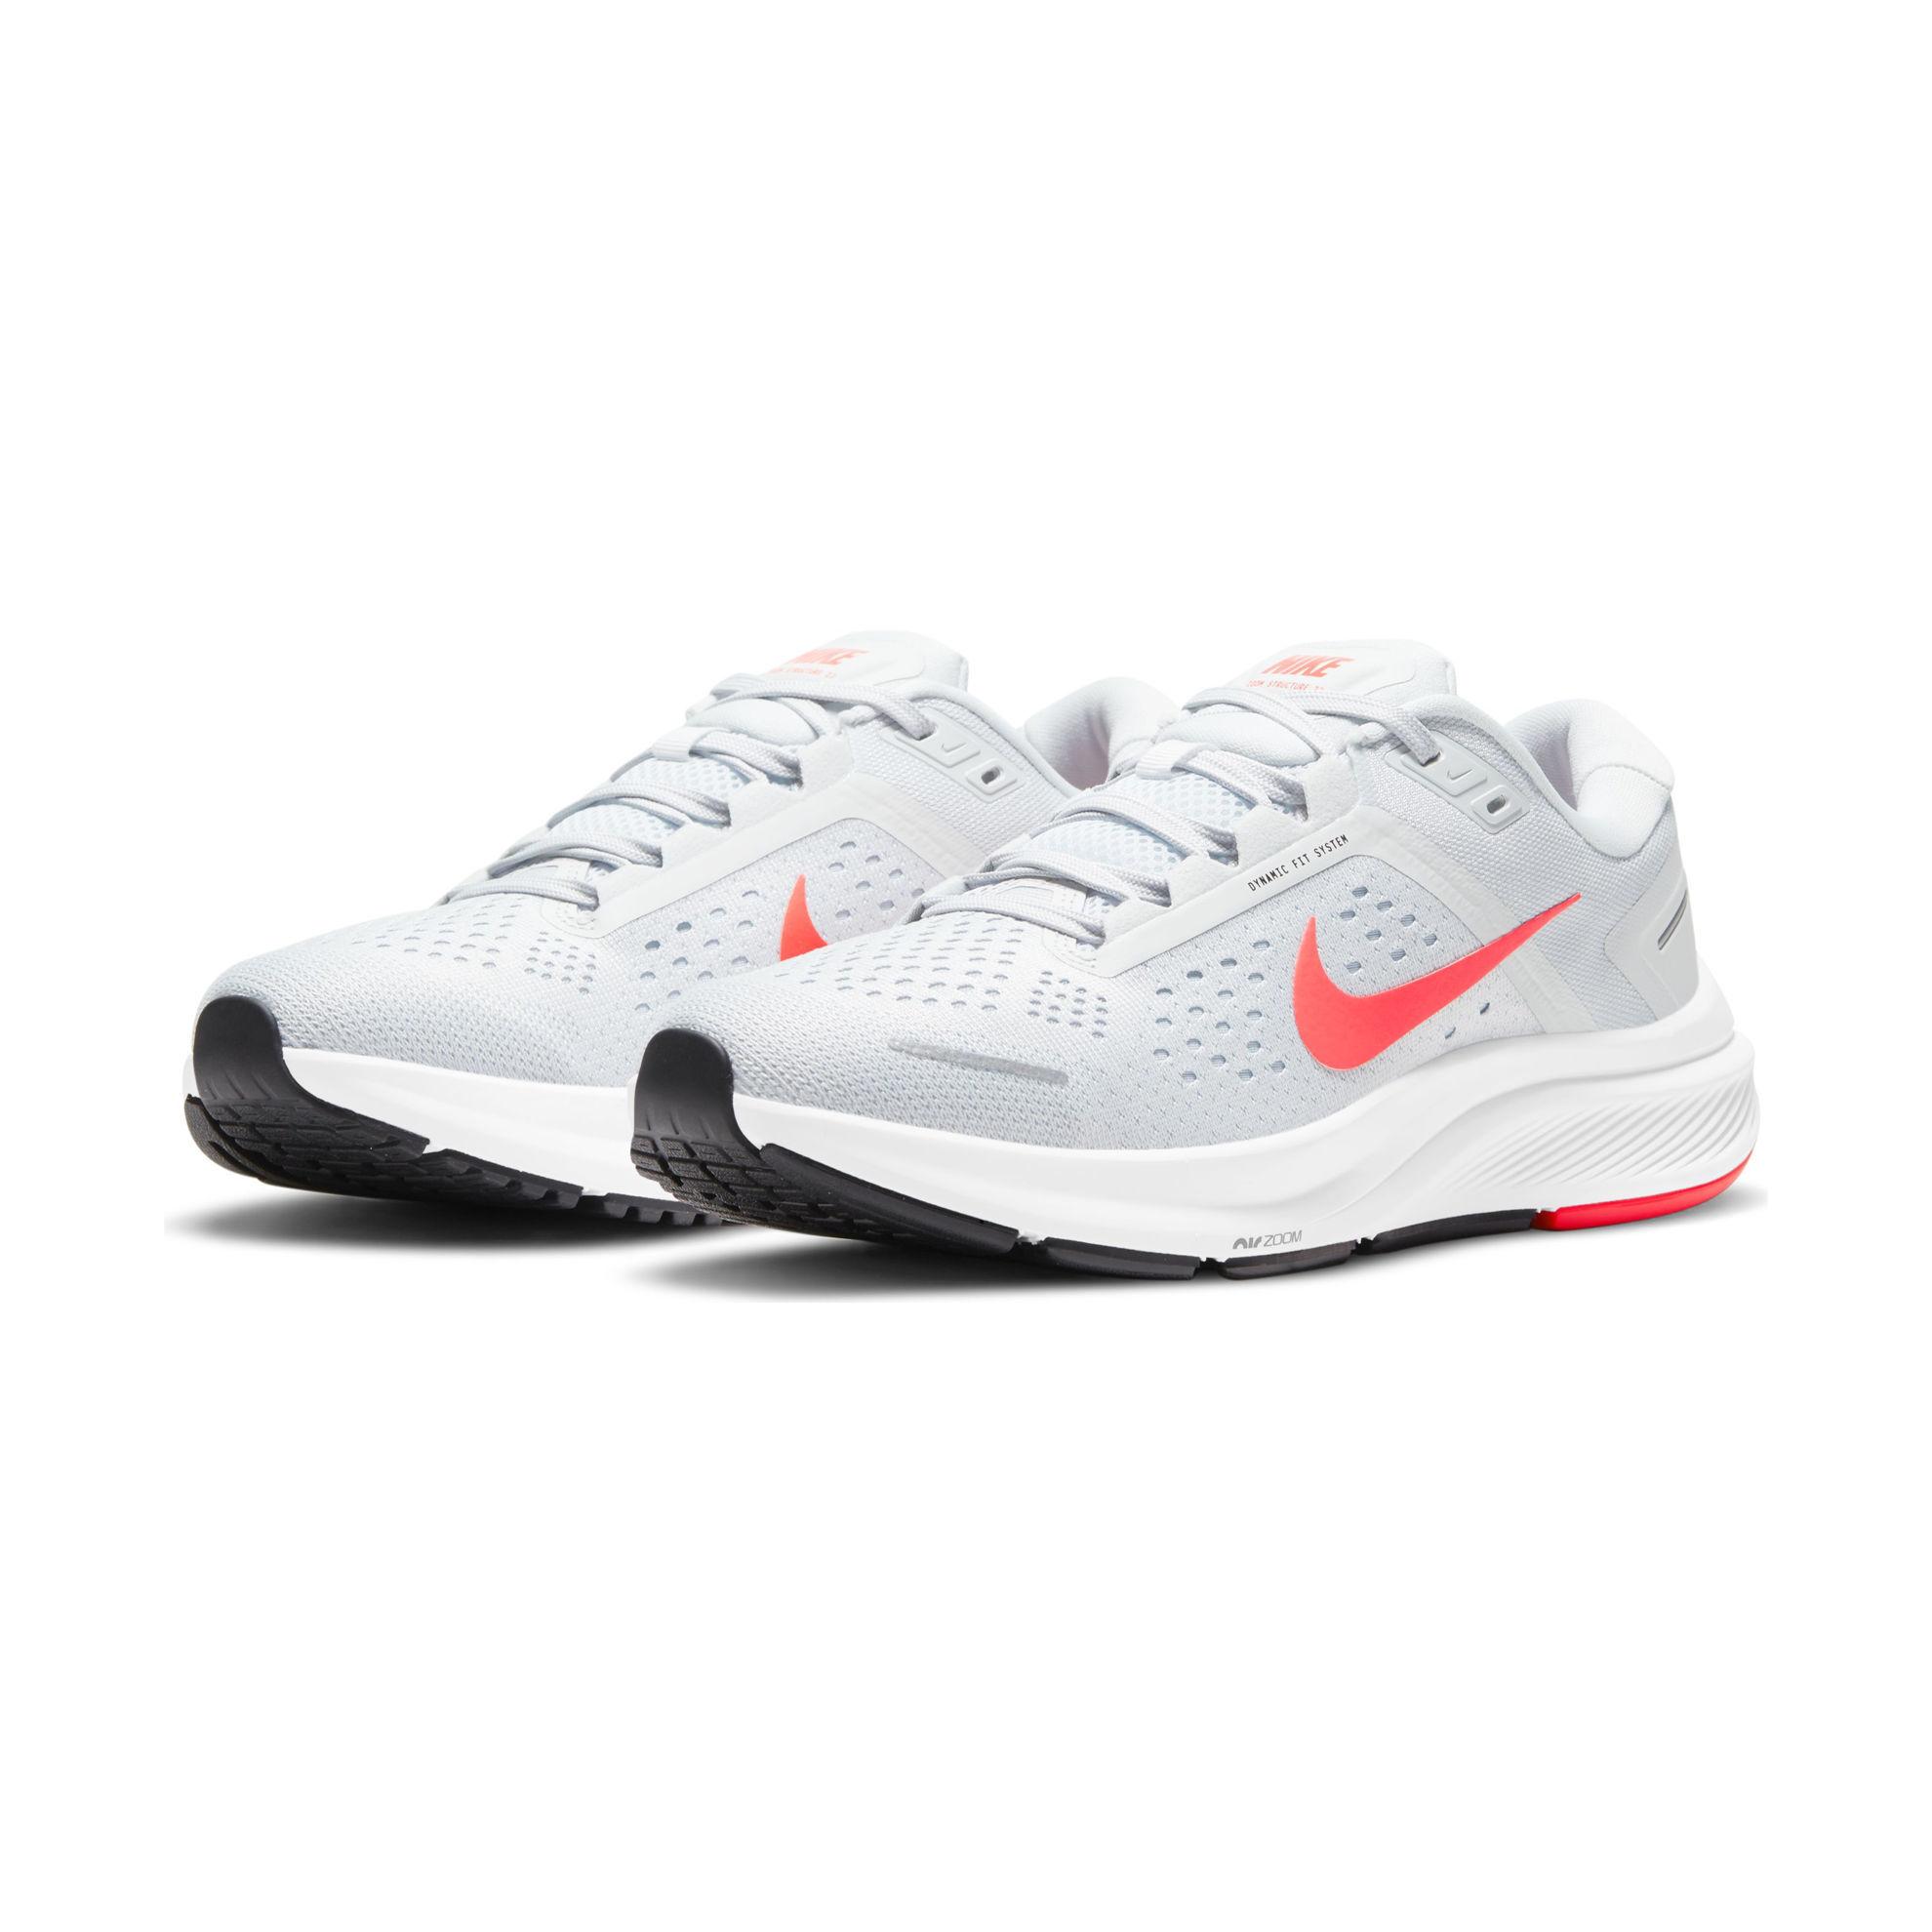 Bilde av wmns Nike Air Zoom Structure 23 CZ6721-009